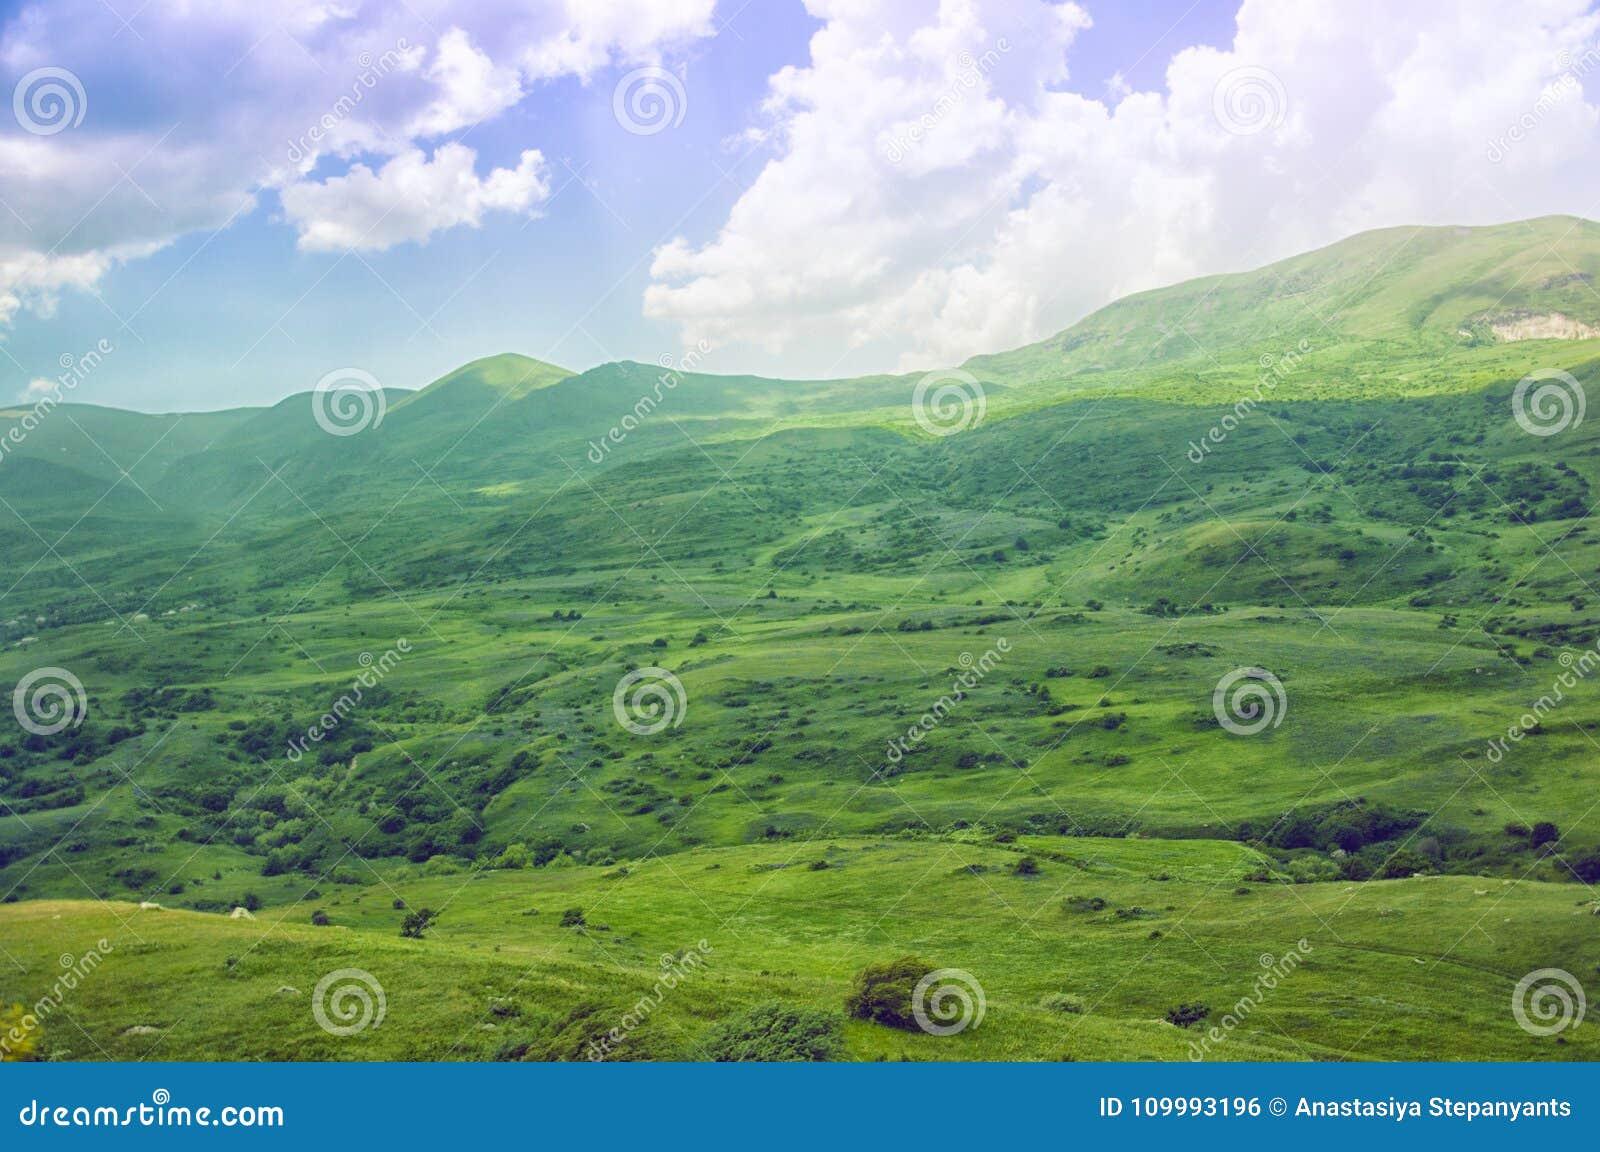 Green Valley. Mountainous terrain, open space landscape. Armenia